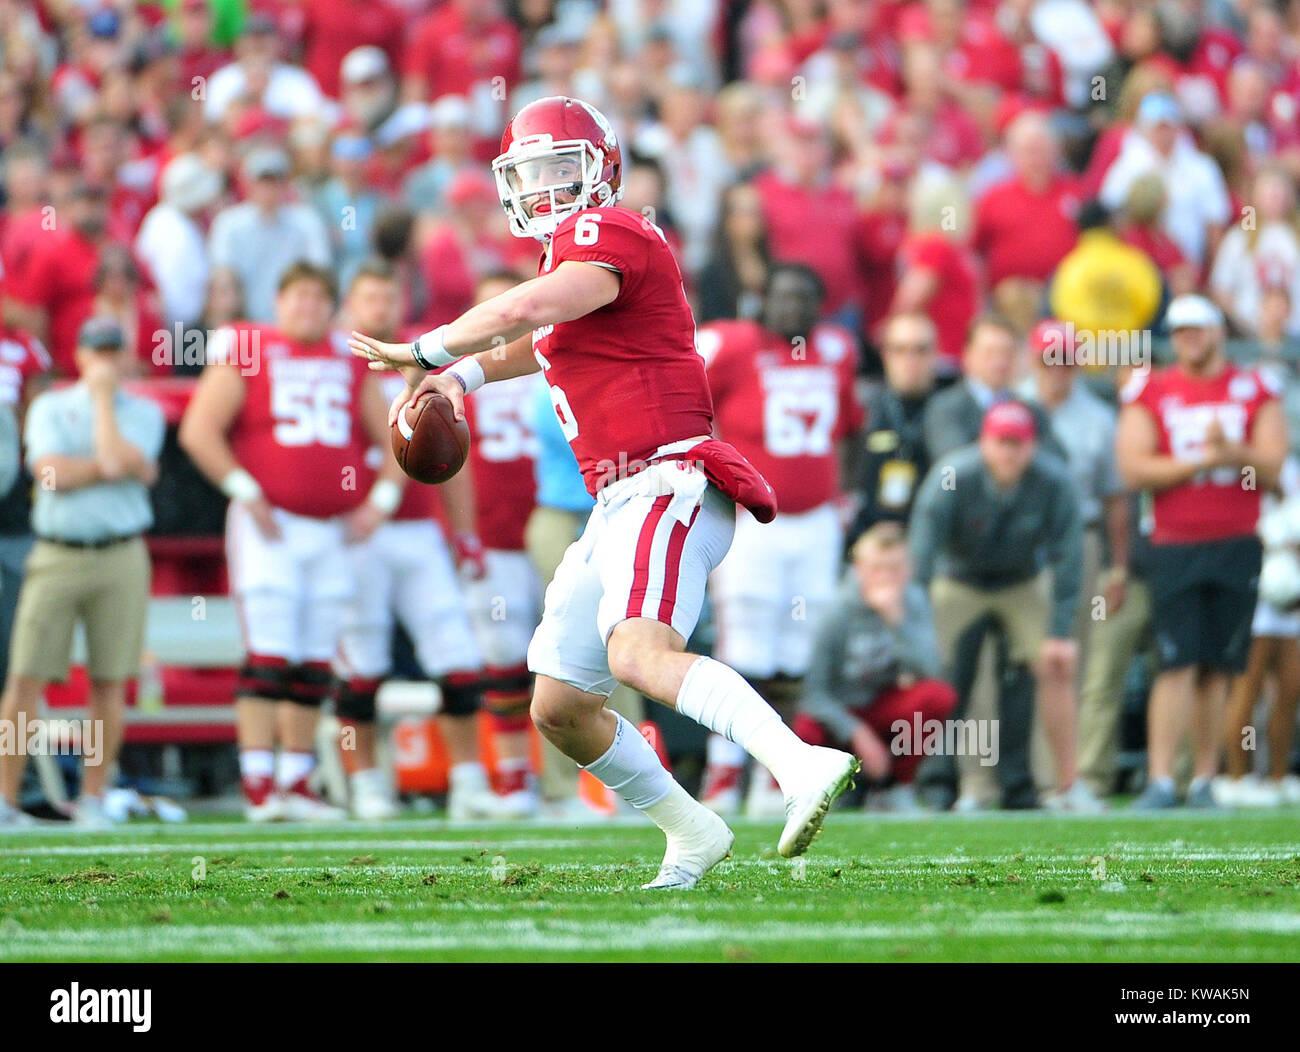 Pasadena, California, USA. 01st Jan, 2018. Oklahoma Sooners quarterback Baker Mayfield #6 during the 2018 Rose Bowl Stock Photo